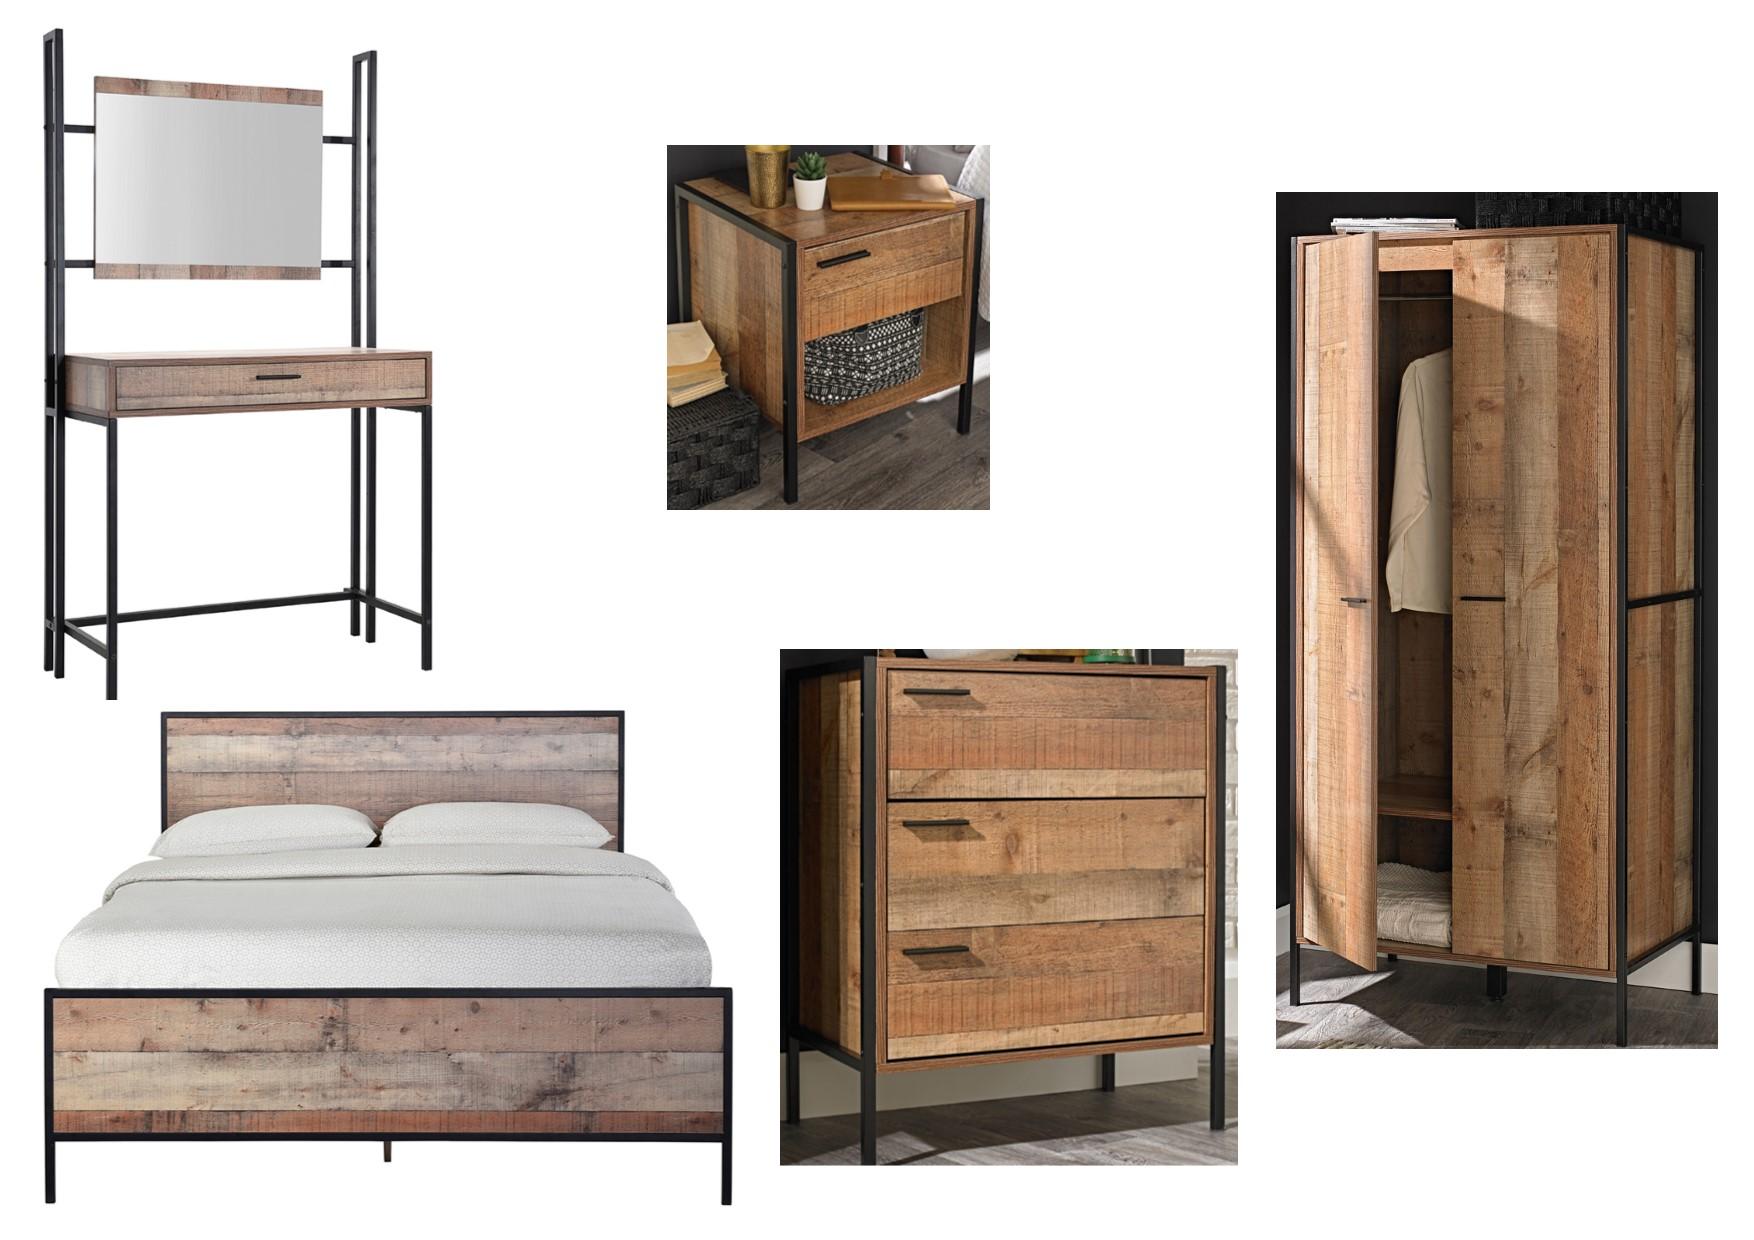 Details about Hoxton Urban Rustic Bedroom Furniture Metal Frames - Bedside,  Drawers, Wardrobe